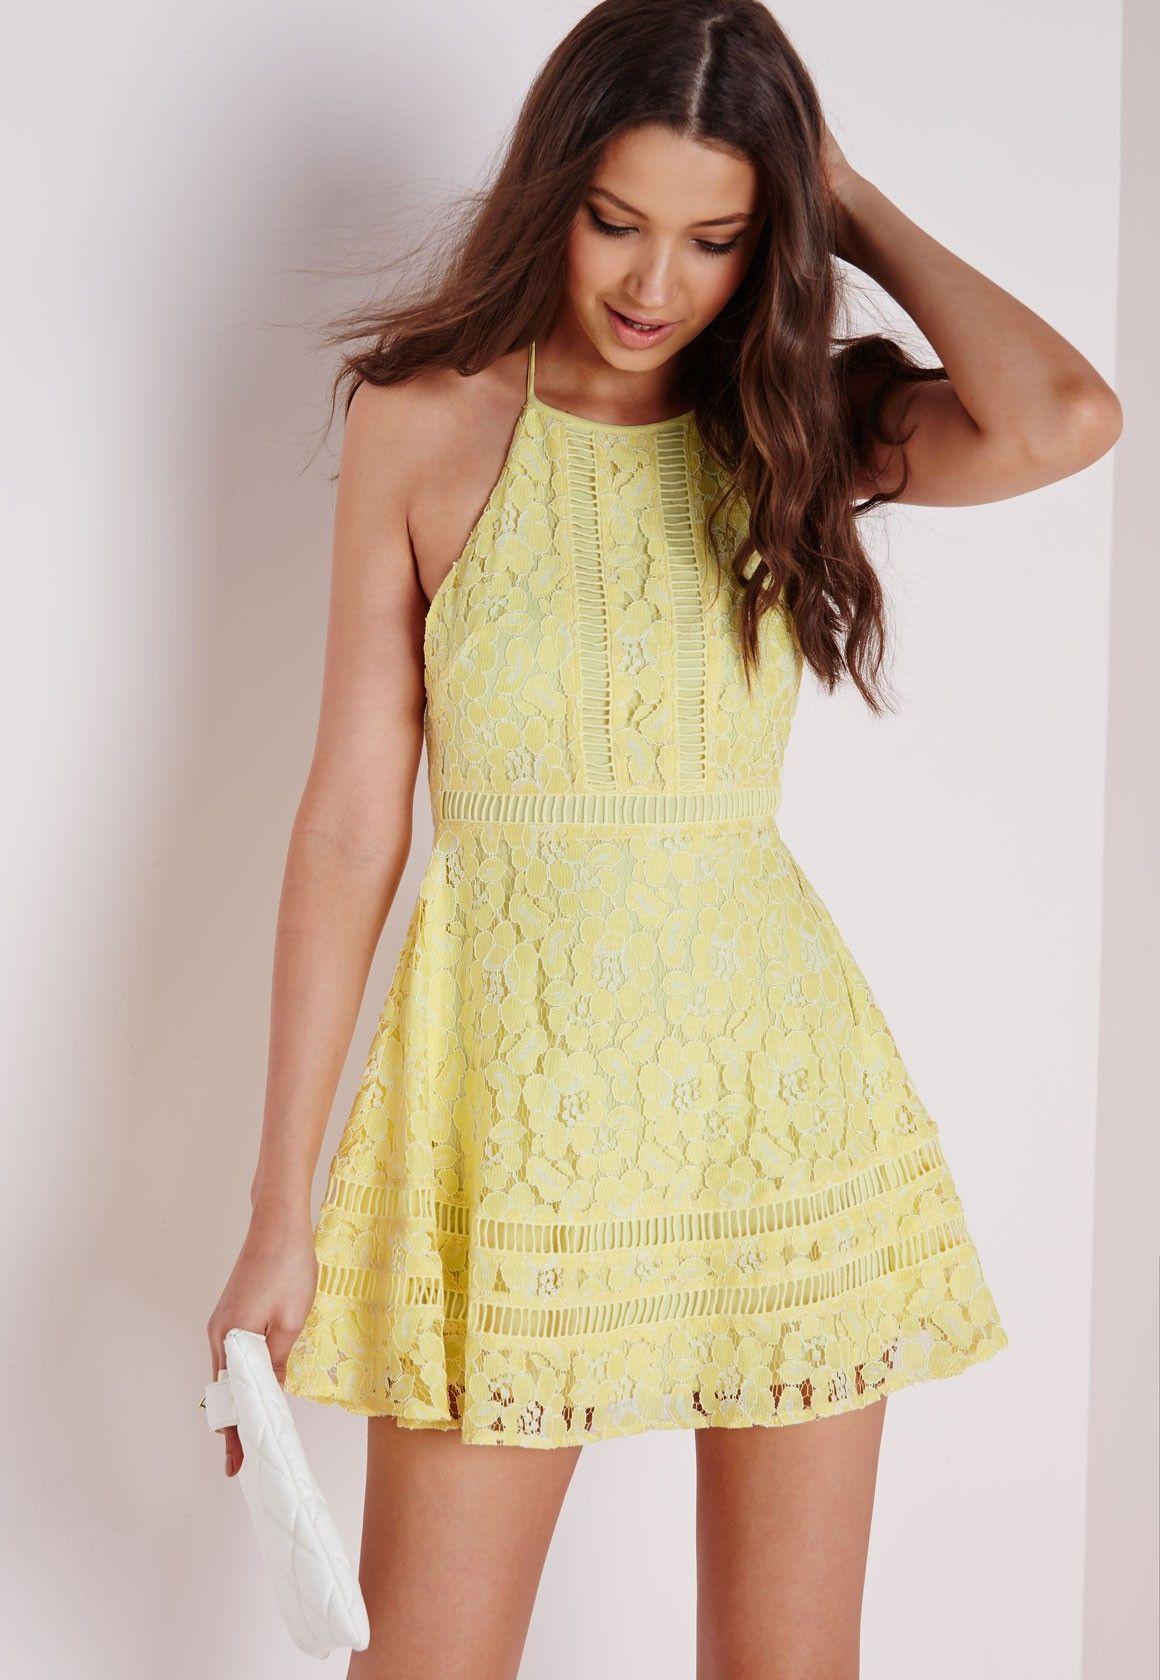 Lace Cross Back Ladder Skater Dress Lemon - Dresses - Skater Dresses -  Missguided a74a6a87d